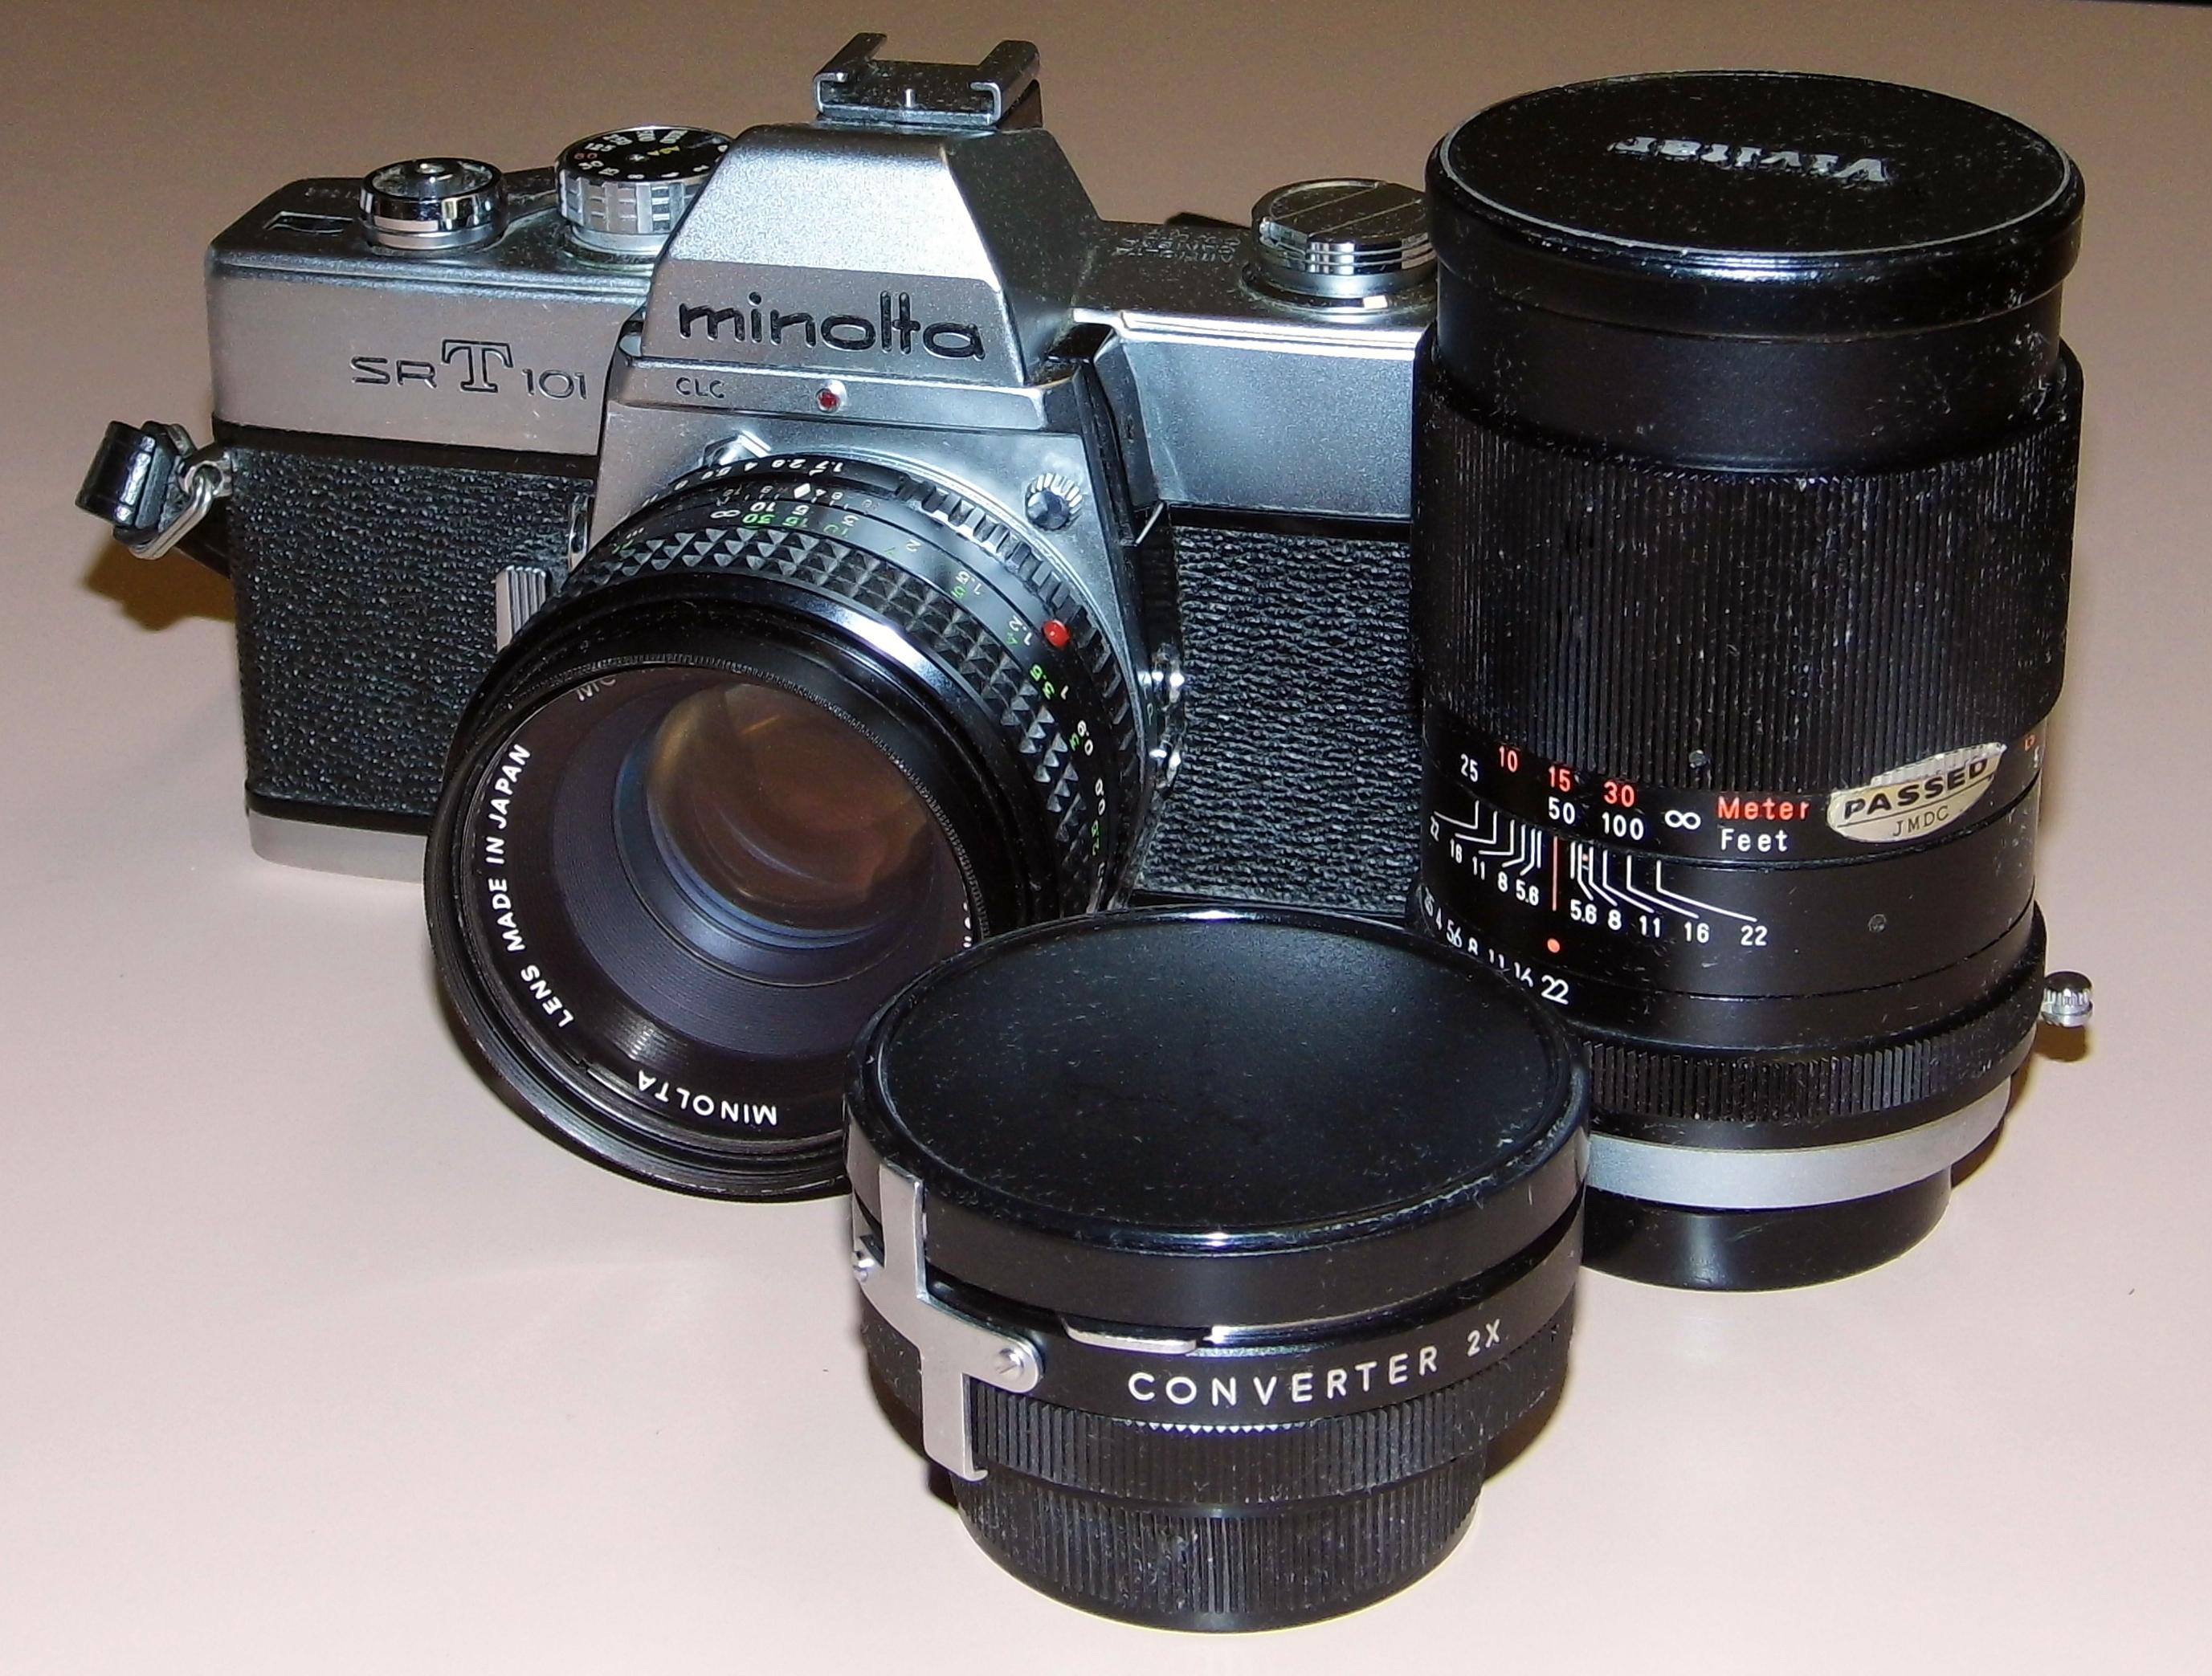 file minolta srt 101 35mm manual focus slr film camera through the rh commons wikimedia org minolta manual lens mount best minolta manual focus lenses